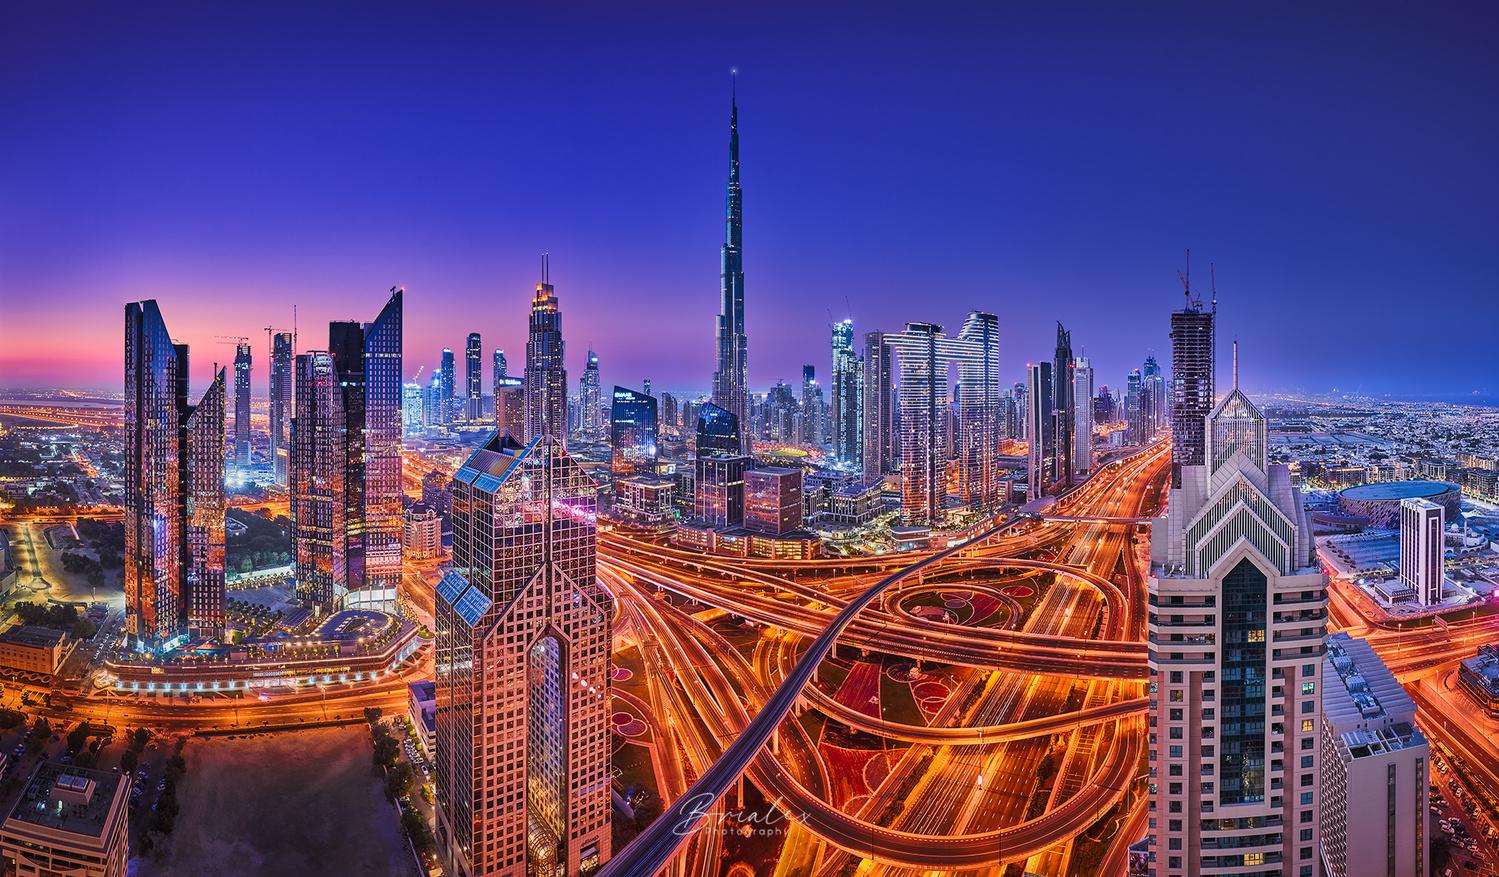 Dubai Rising from its Veins by Brighilă Alex